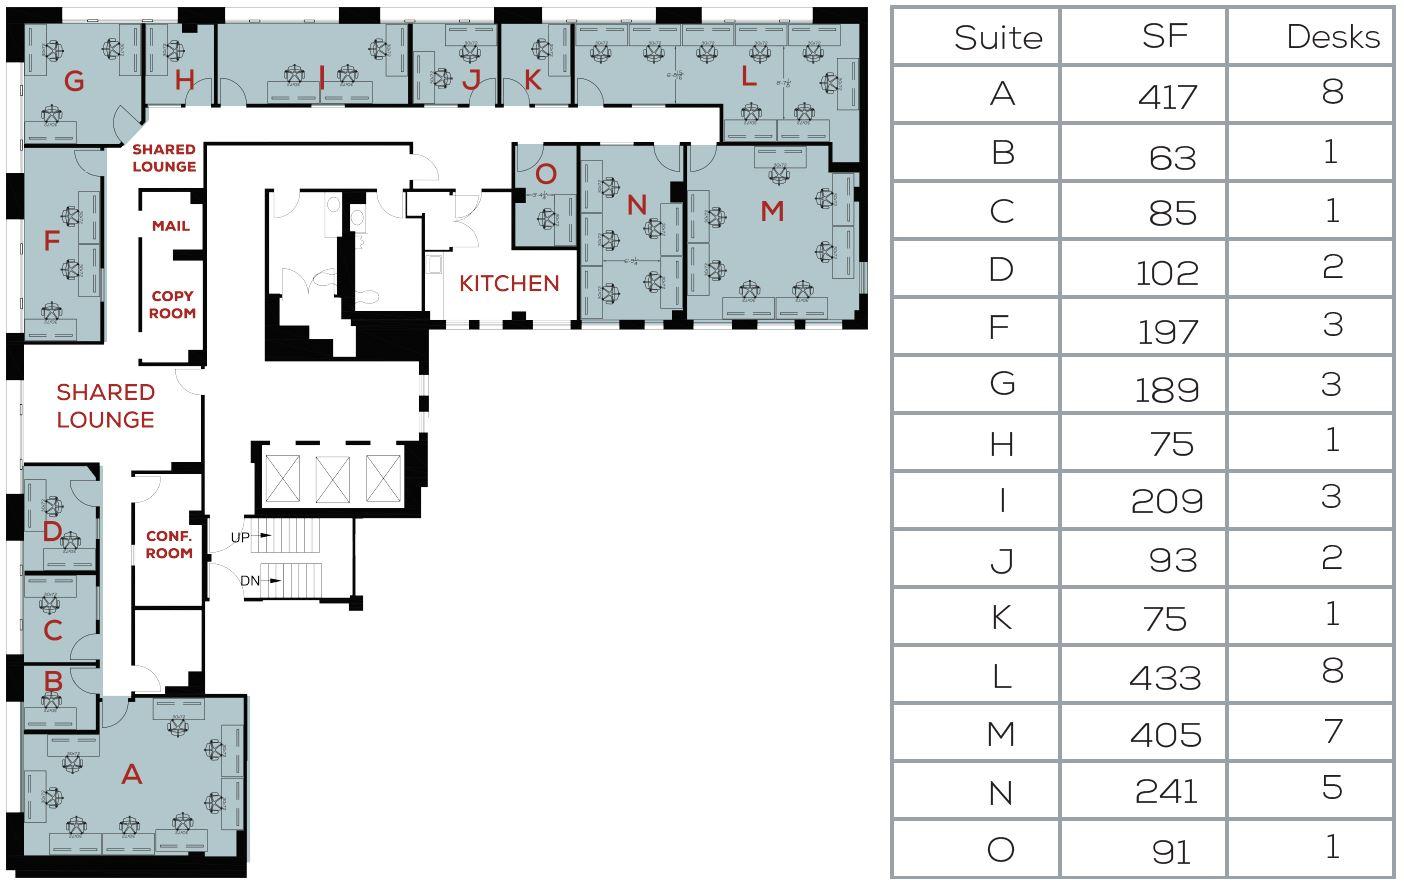 flex private office space.JPG